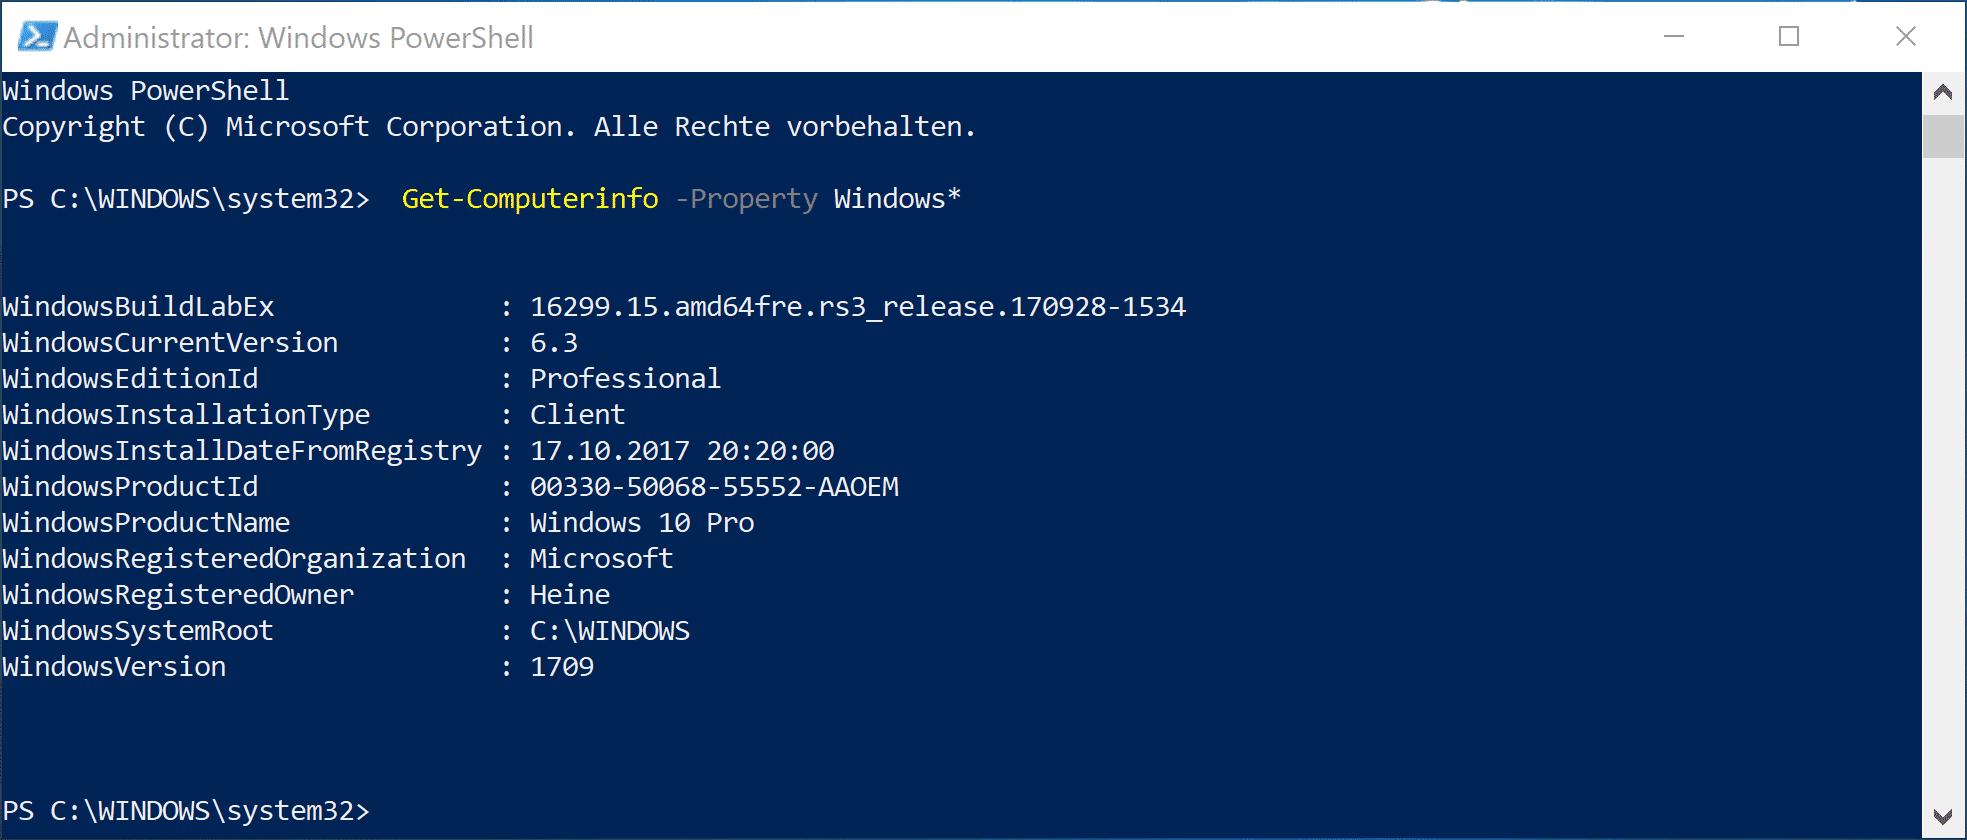 Get-Computerinfo -Property Windows